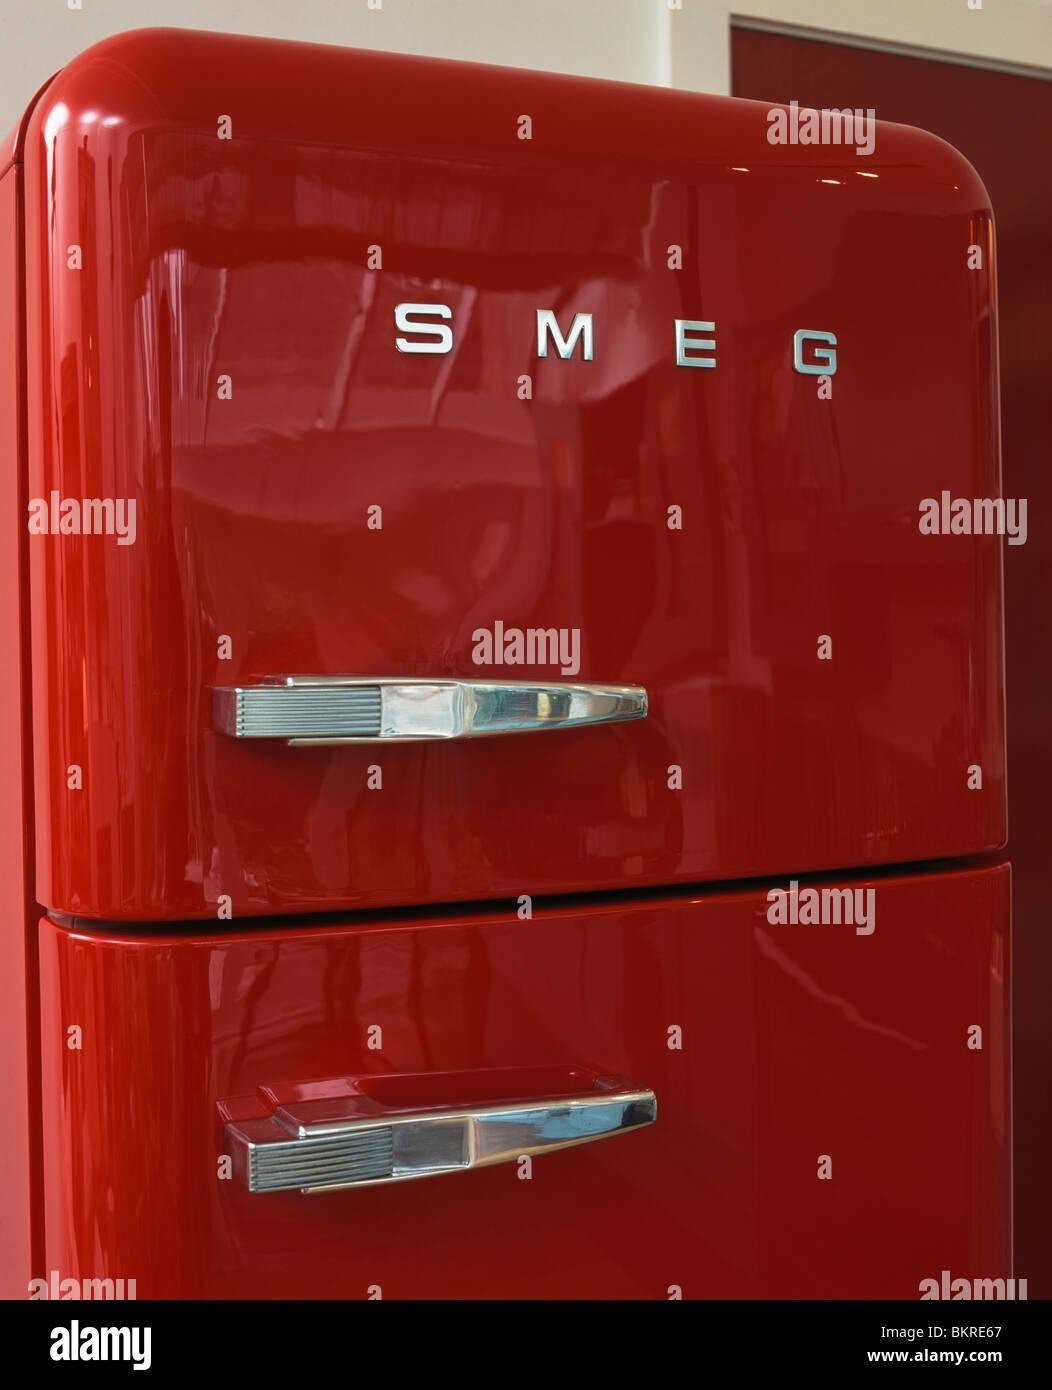 smeg fridges stock photos smeg fridges stock images alamy. Black Bedroom Furniture Sets. Home Design Ideas